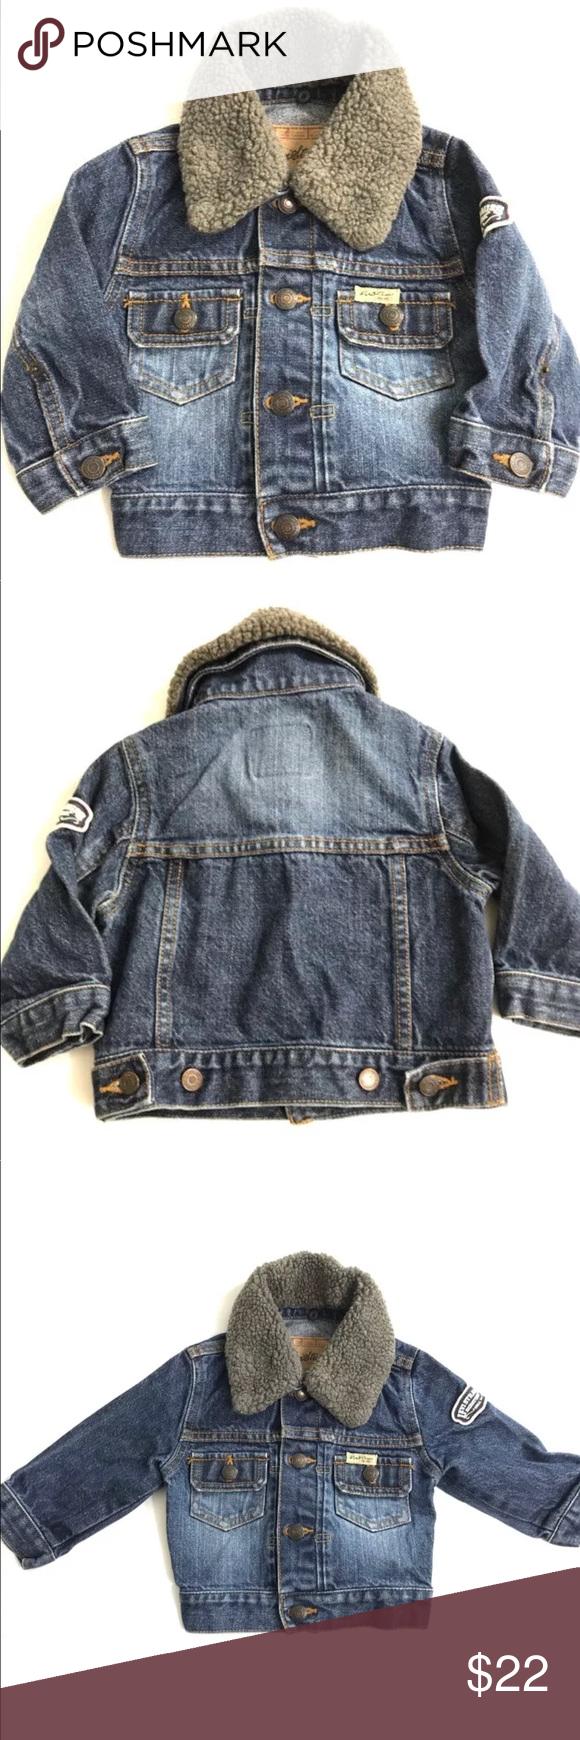 Levi S Baby Boy Jean Jacket Trucker Size 12 Months Levi S Strauss Signature Jean Trucker Jacket Baby Boy Infant Si Boys Jean Jacket Baby Boy Jeans Jean Jacket [ 1740 x 580 Pixel ]